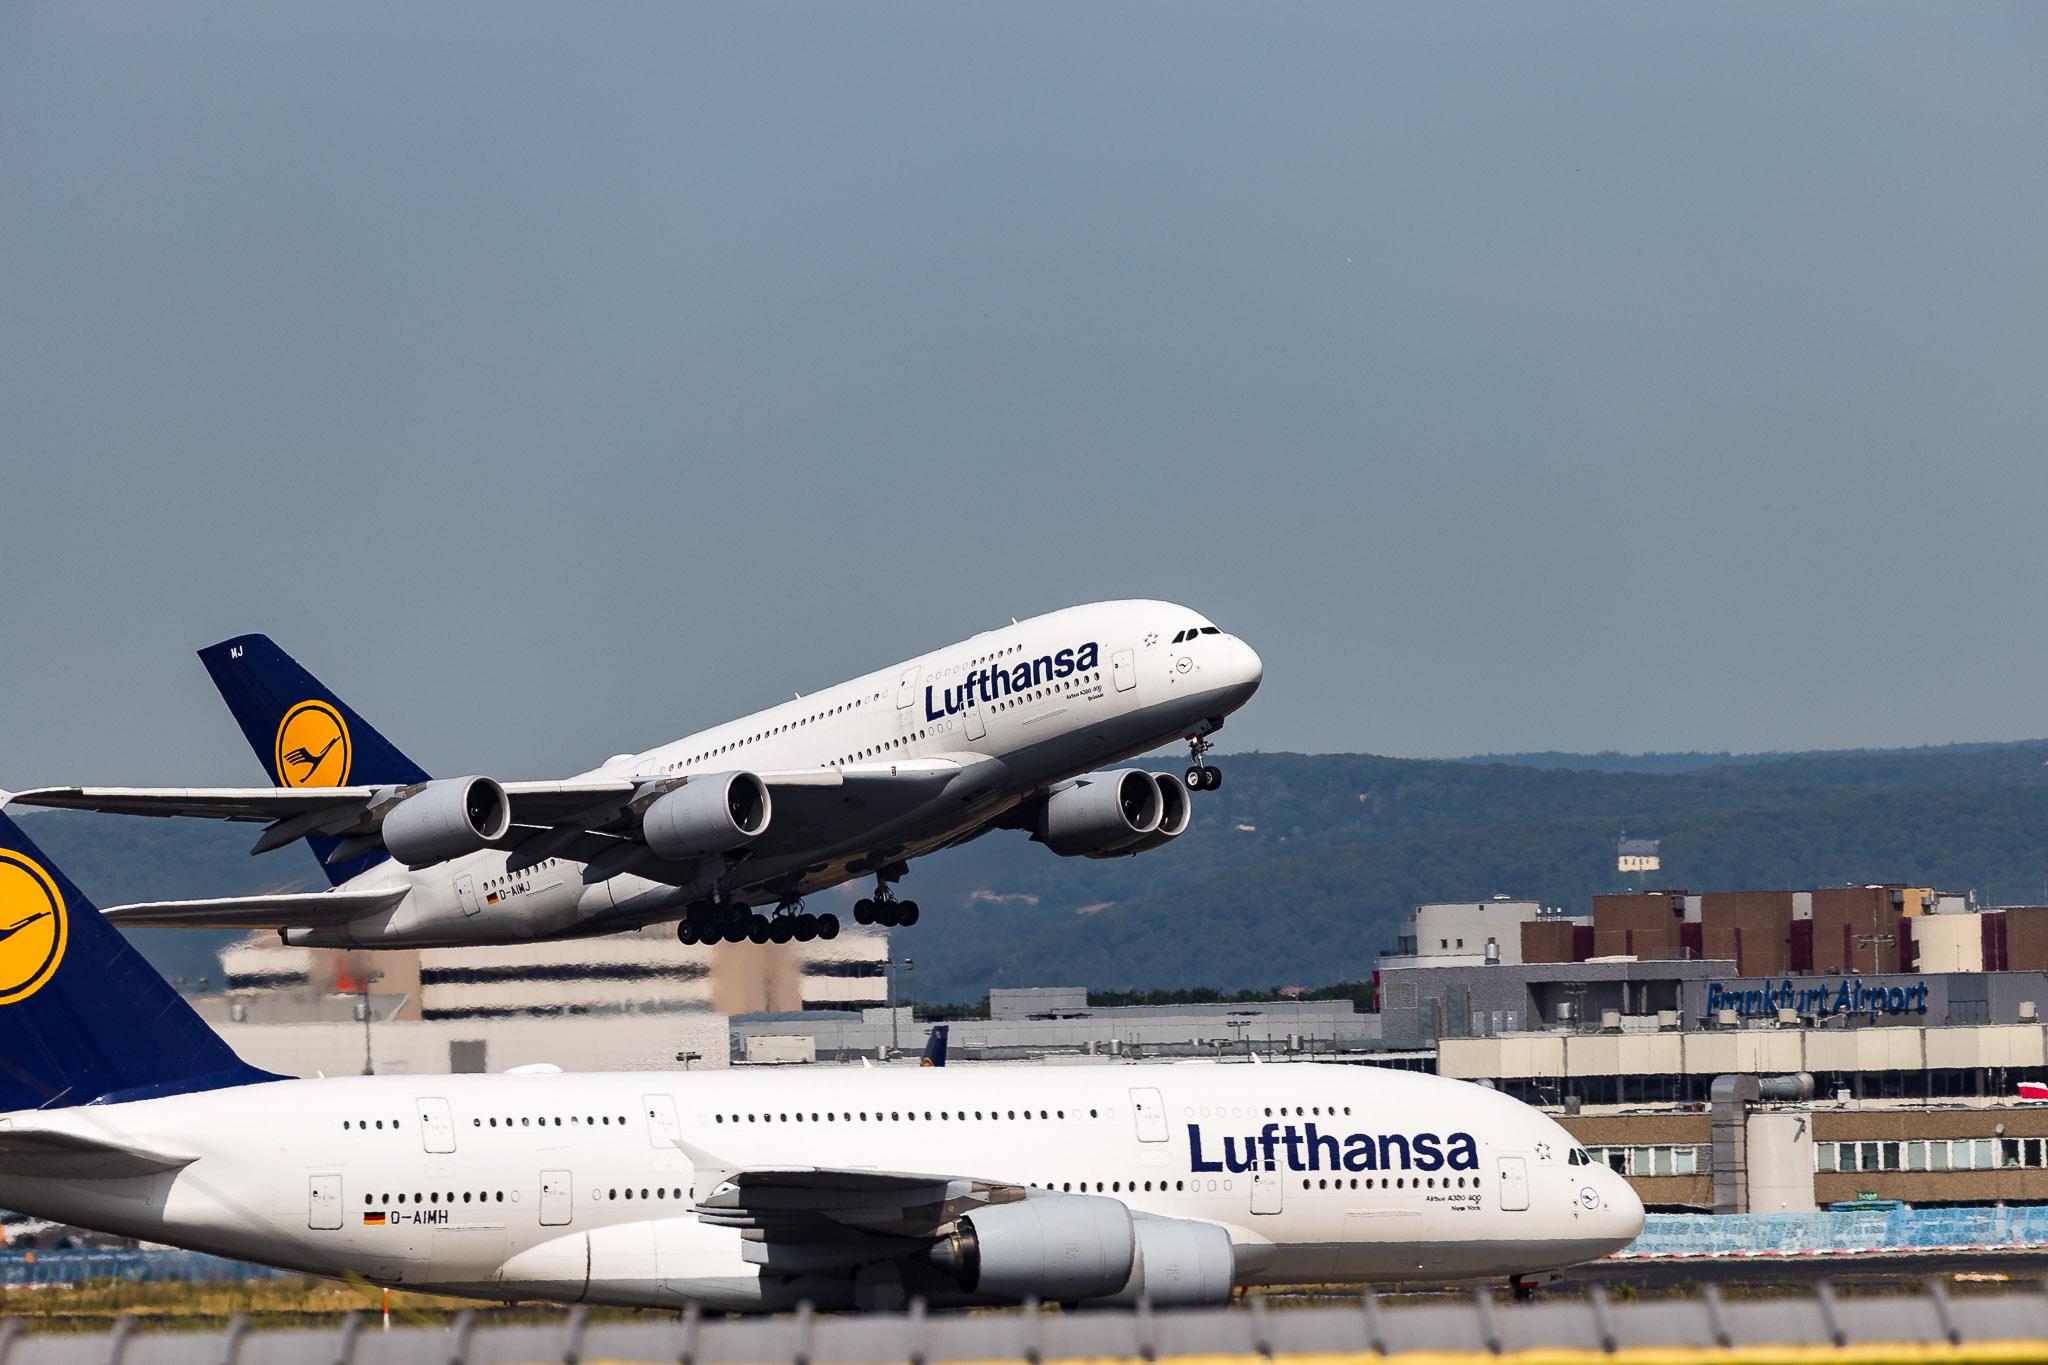 Frankfurt airport plane watching, Germany